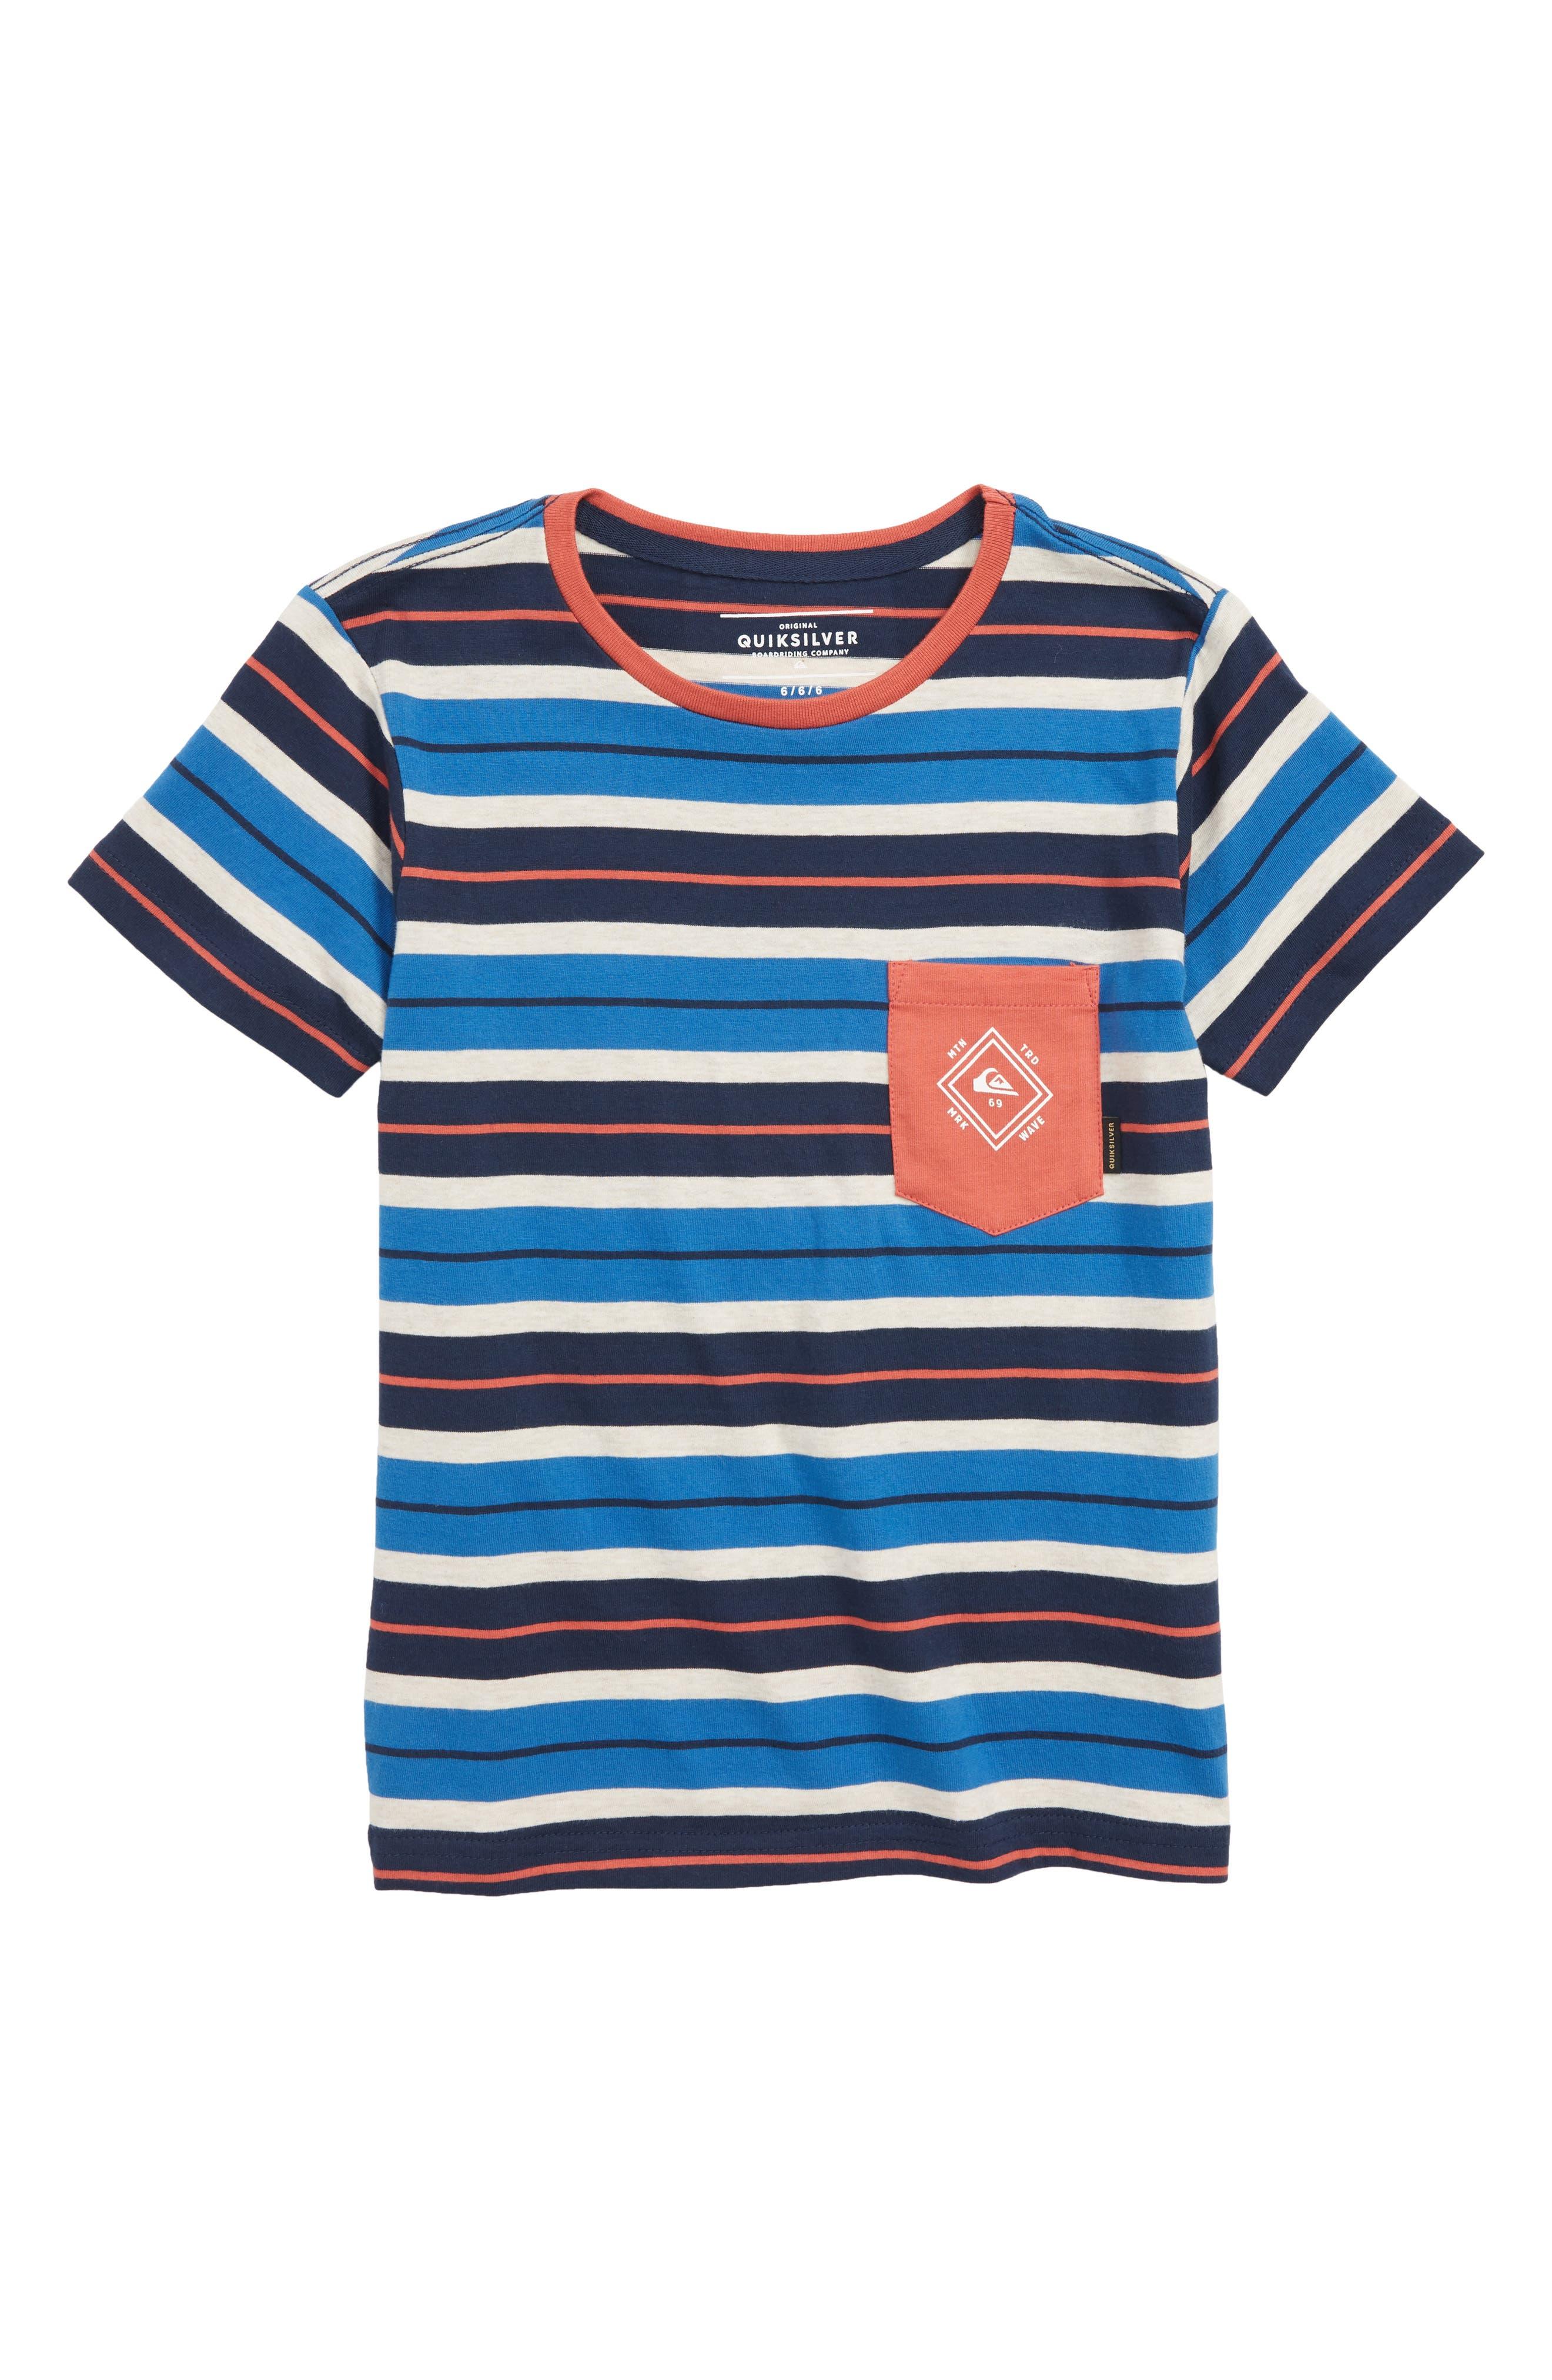 Oloa Stripe Shirt,                             Main thumbnail 1, color,                             Bright Cobalt